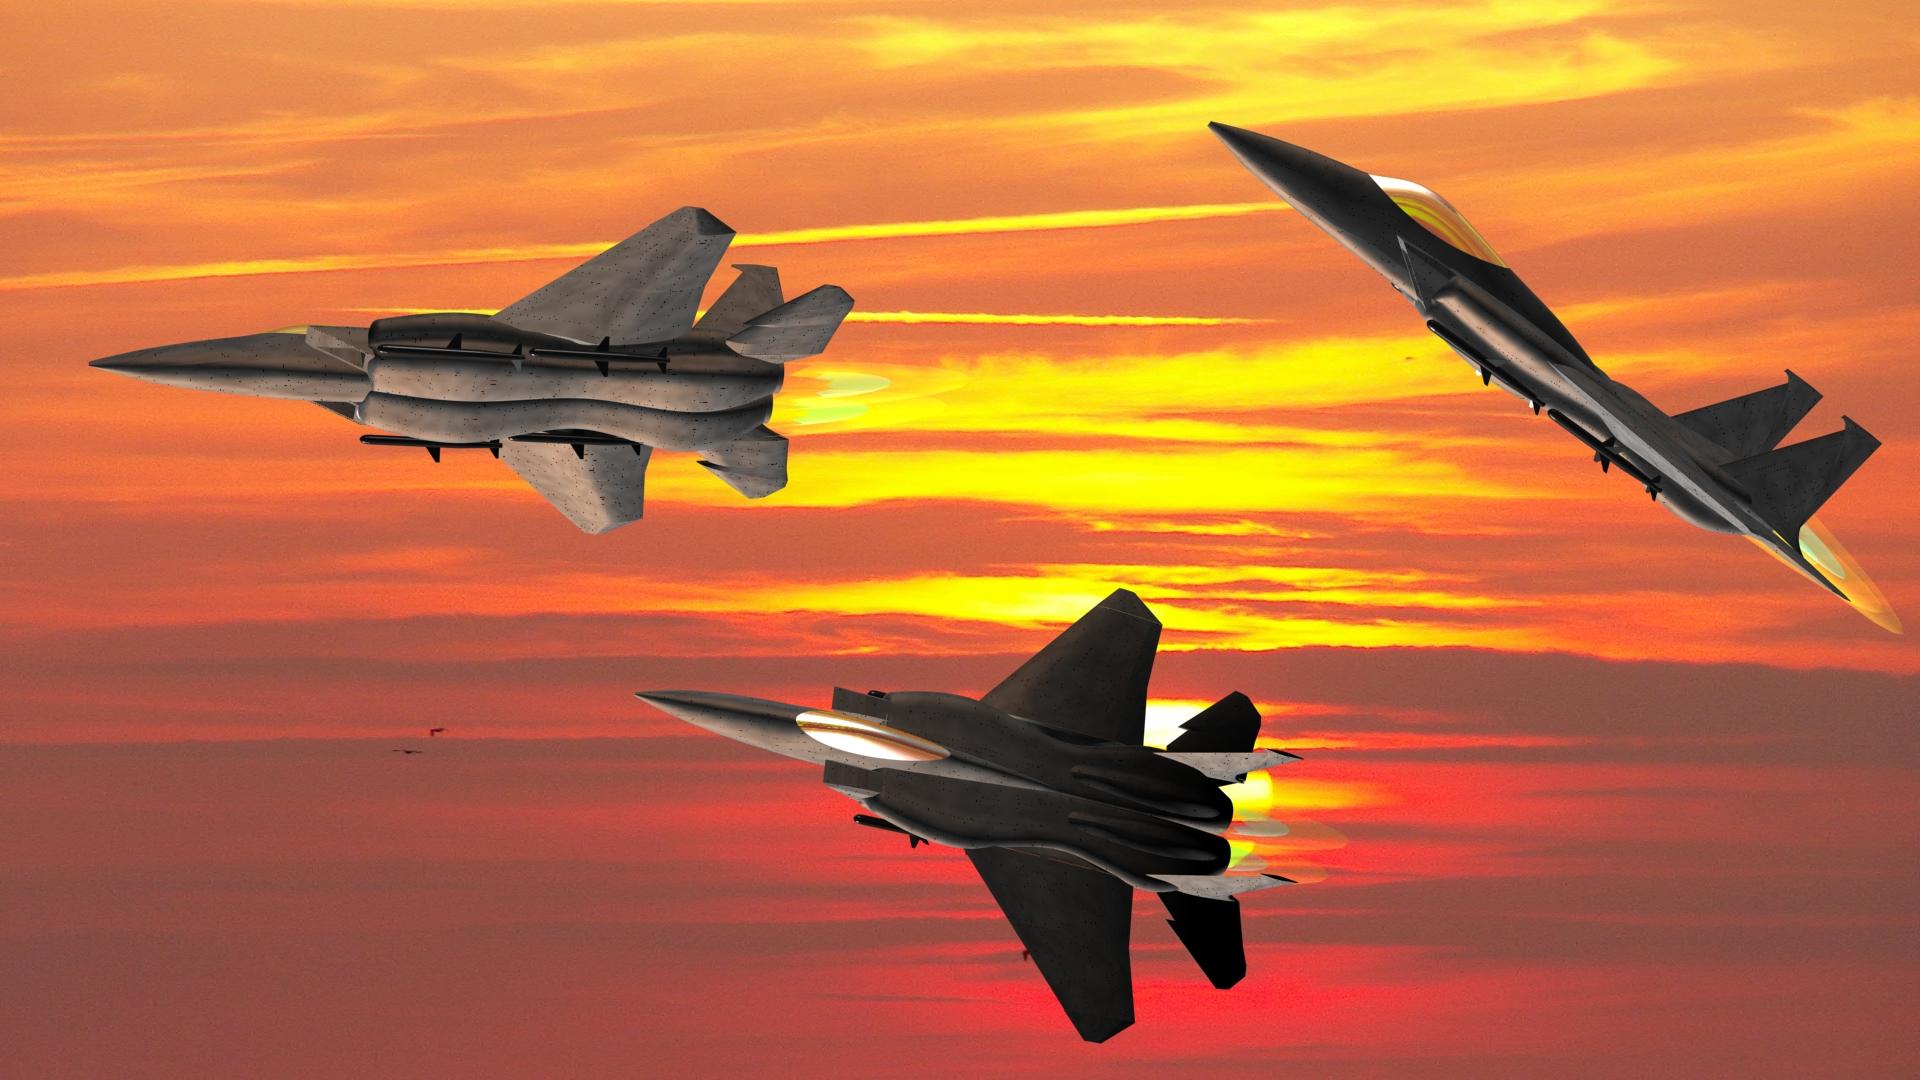 F15a sunset